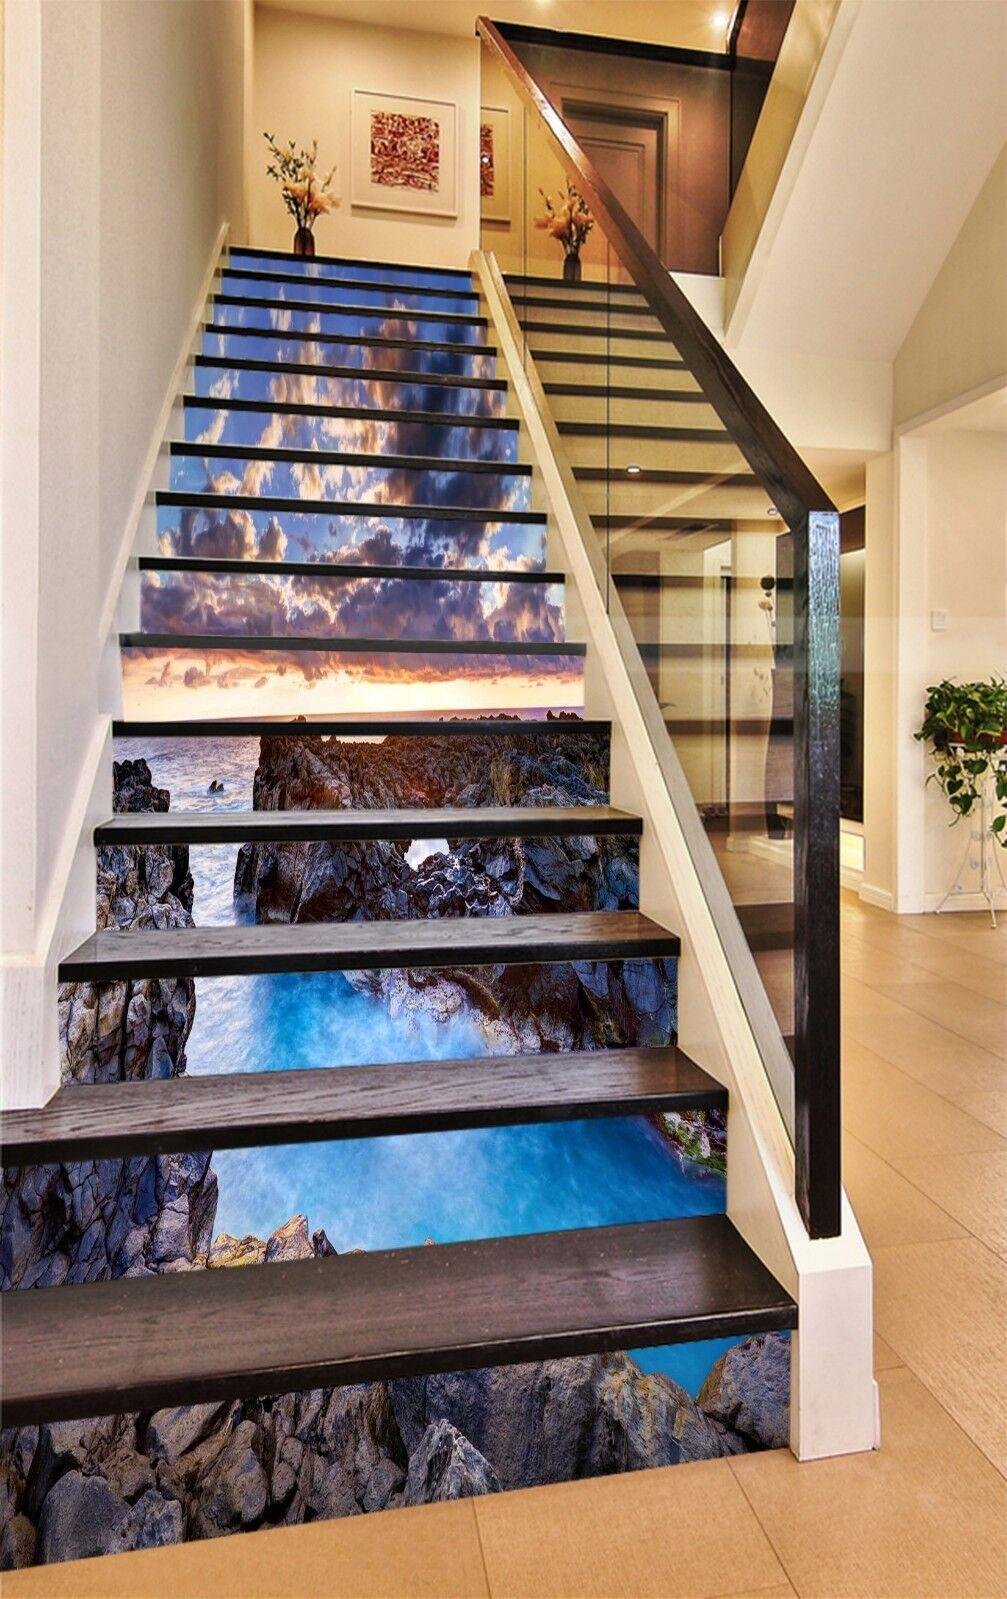 3D Hills River 71 Stair Risers Decoration Photo Mural Vinyl Decal Wallpaper UK